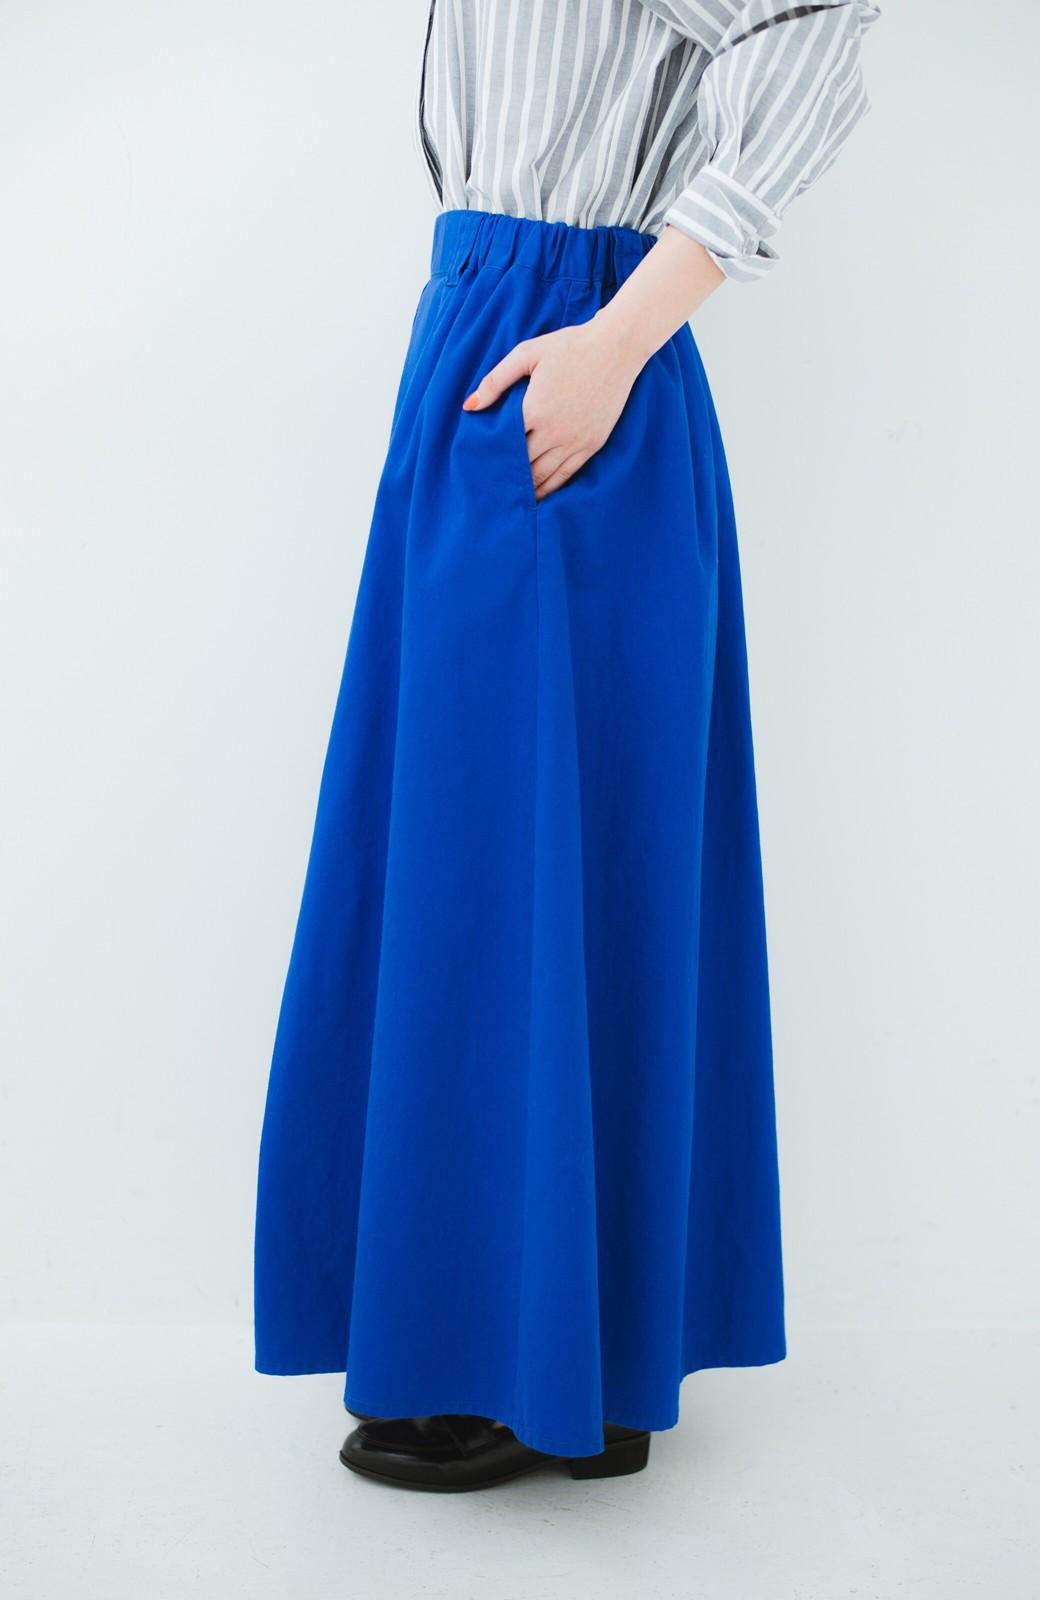 haco! 【今年も再販!】ロングシーズン楽しめる タックボリュームのチノロングスカート <ブルー>の商品写真5